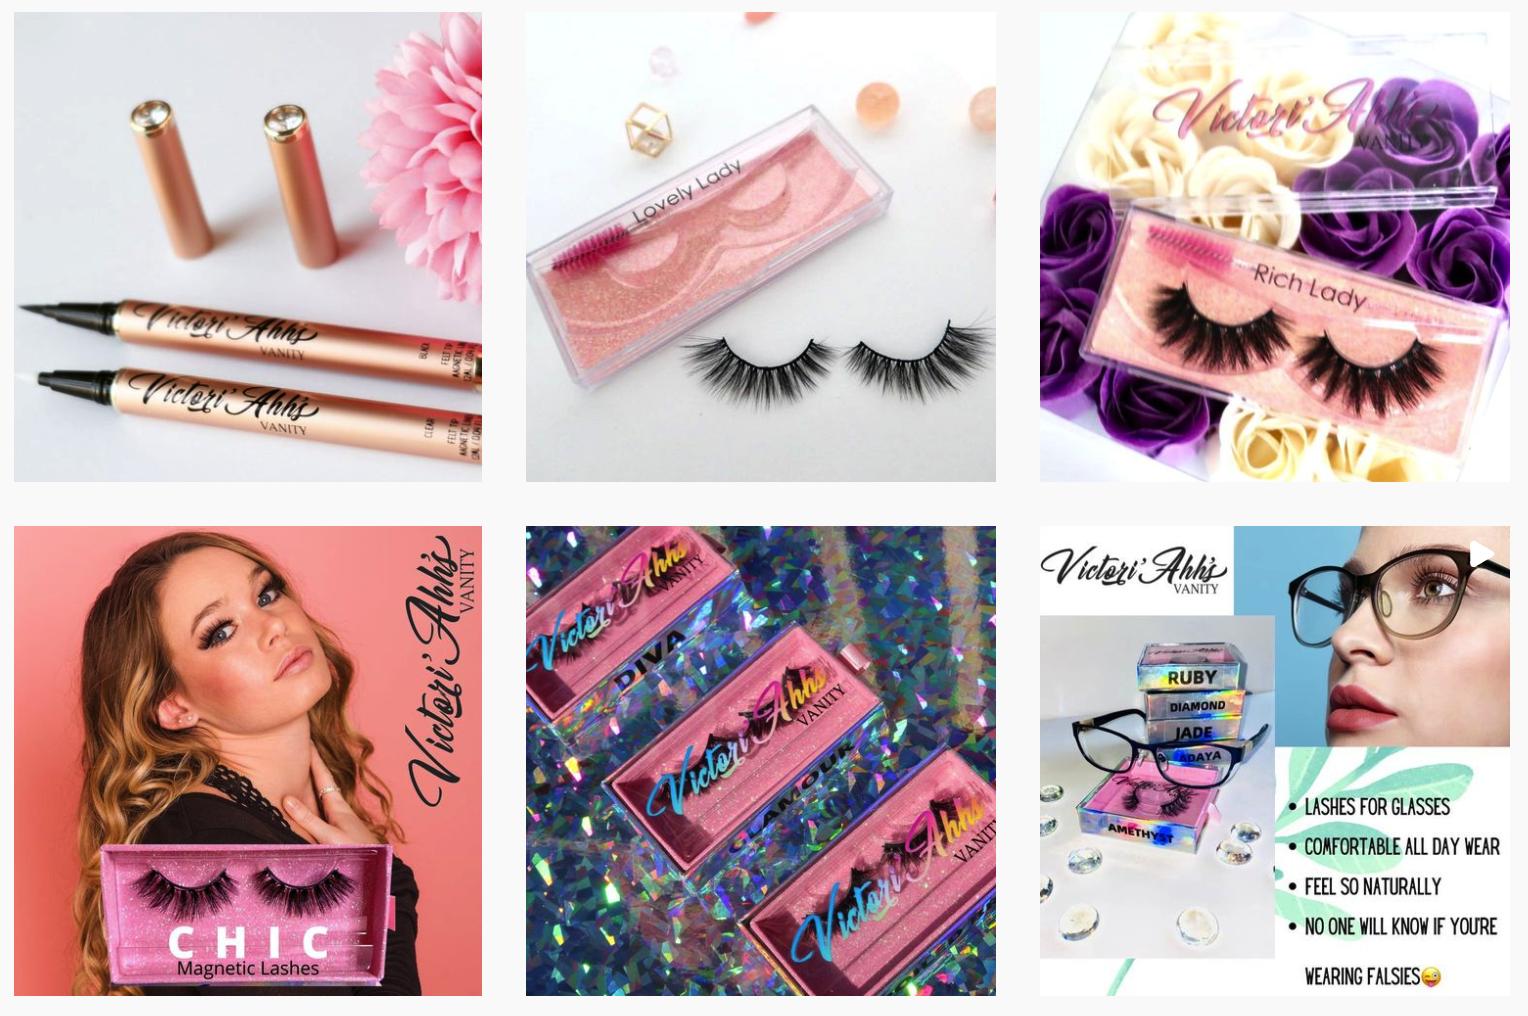 Victori Ahhs Vanity   Makeup brands featured on Afluencer